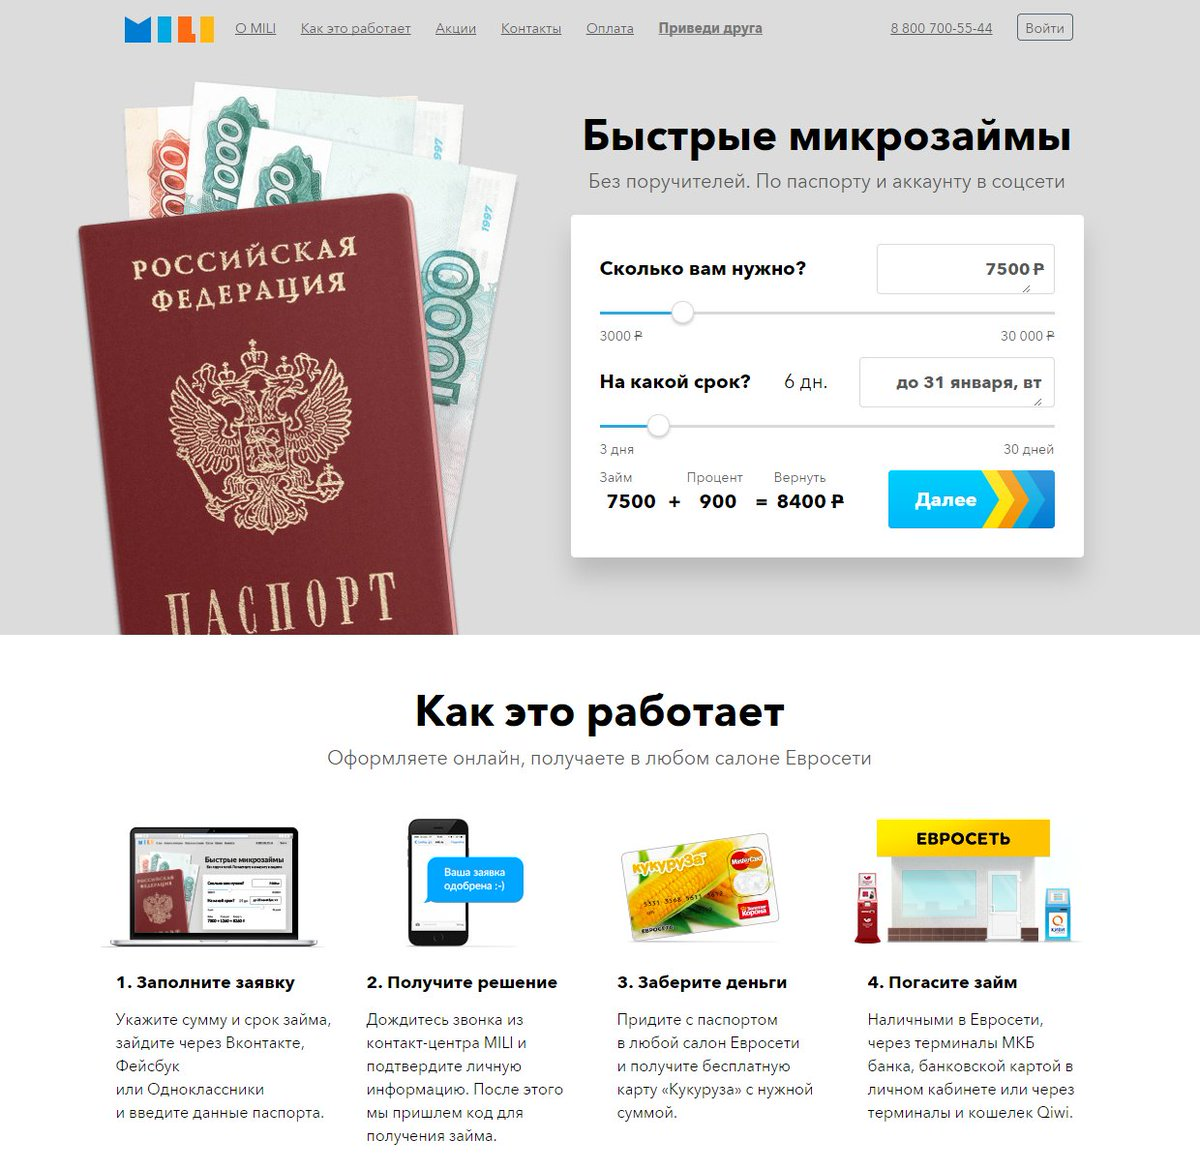 займ онлайн наличными по паспорту